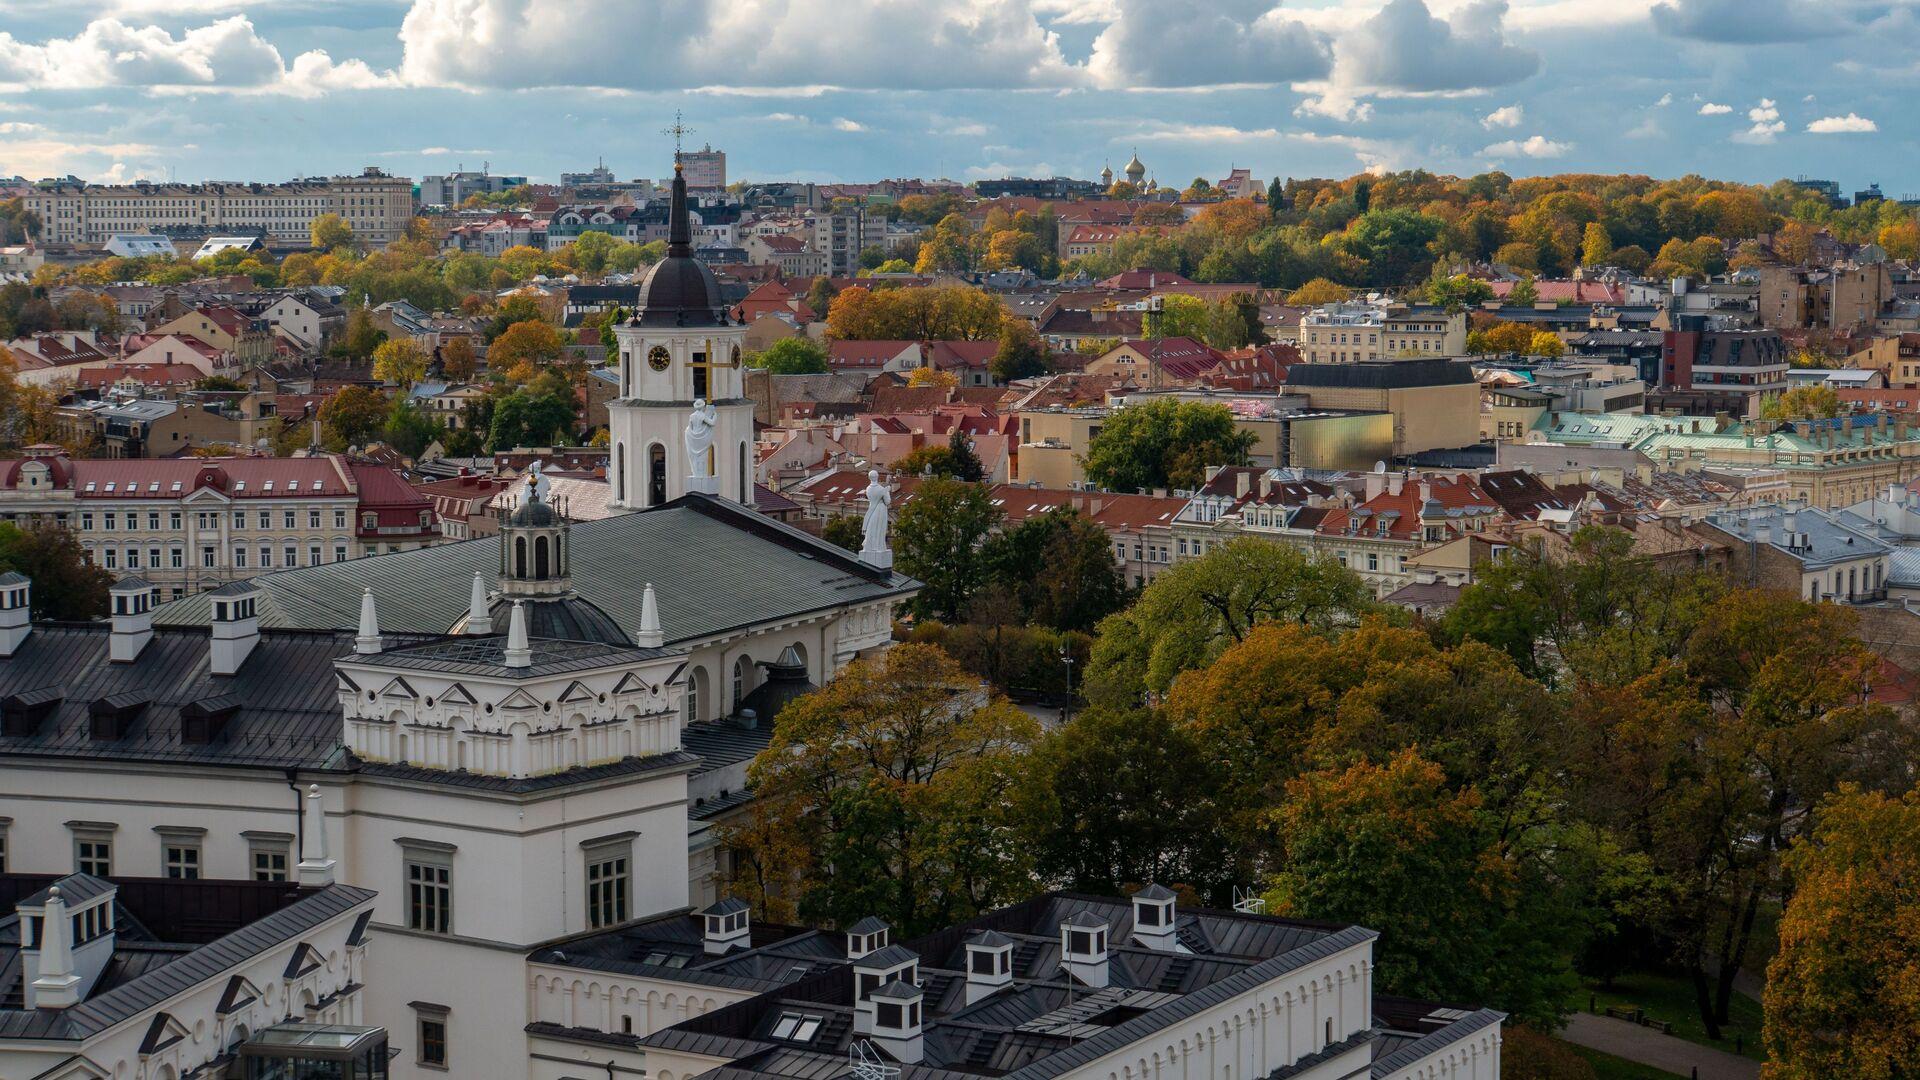 Stolica Litwy - Sputnik Polska, 1920, 07.07.2021